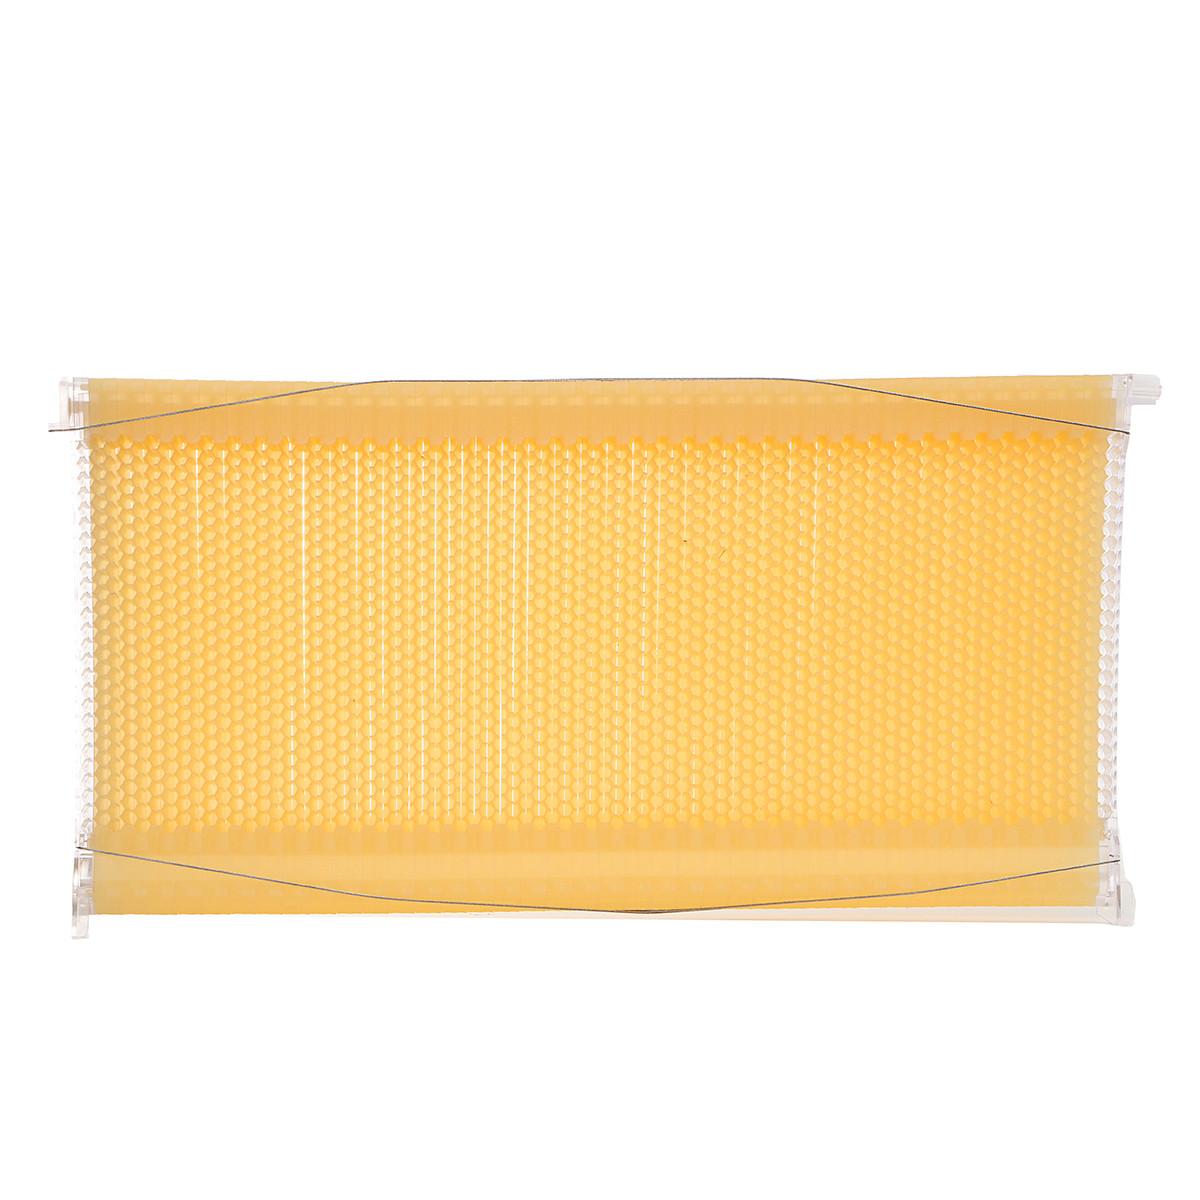 1Pcs Пчелиная рама Auto Honey Hive Beehive Рамки Фурнитура Пчелиные рамы Пищевой пластик 1TopShop